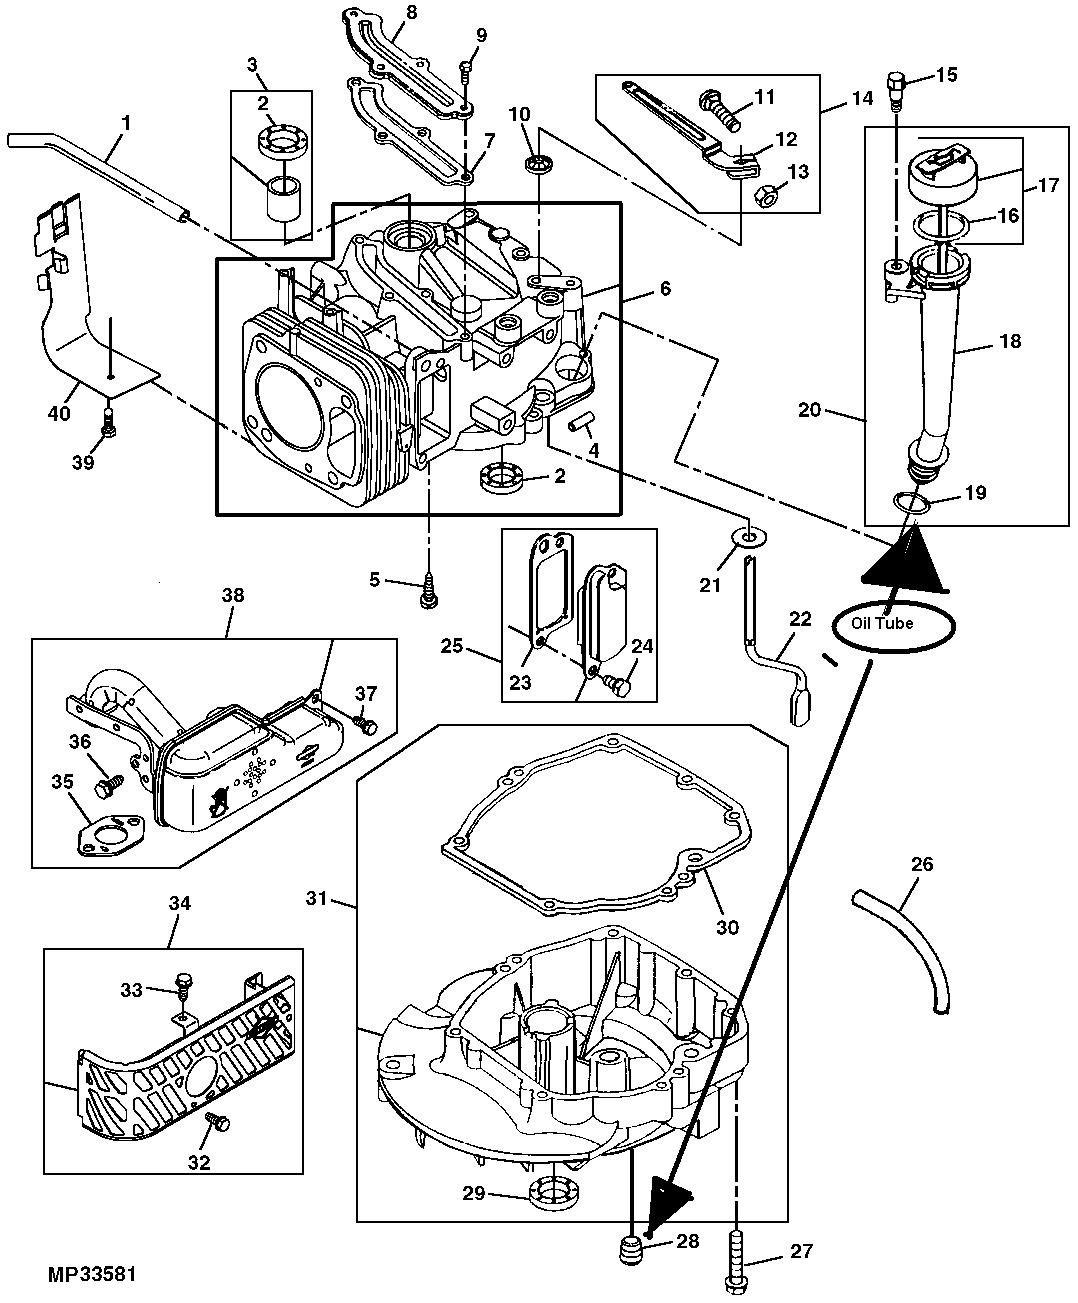 John Deere 425 Wiring Diagram 29 Images Lx188 2009 09 12 002432 Js63e Jd